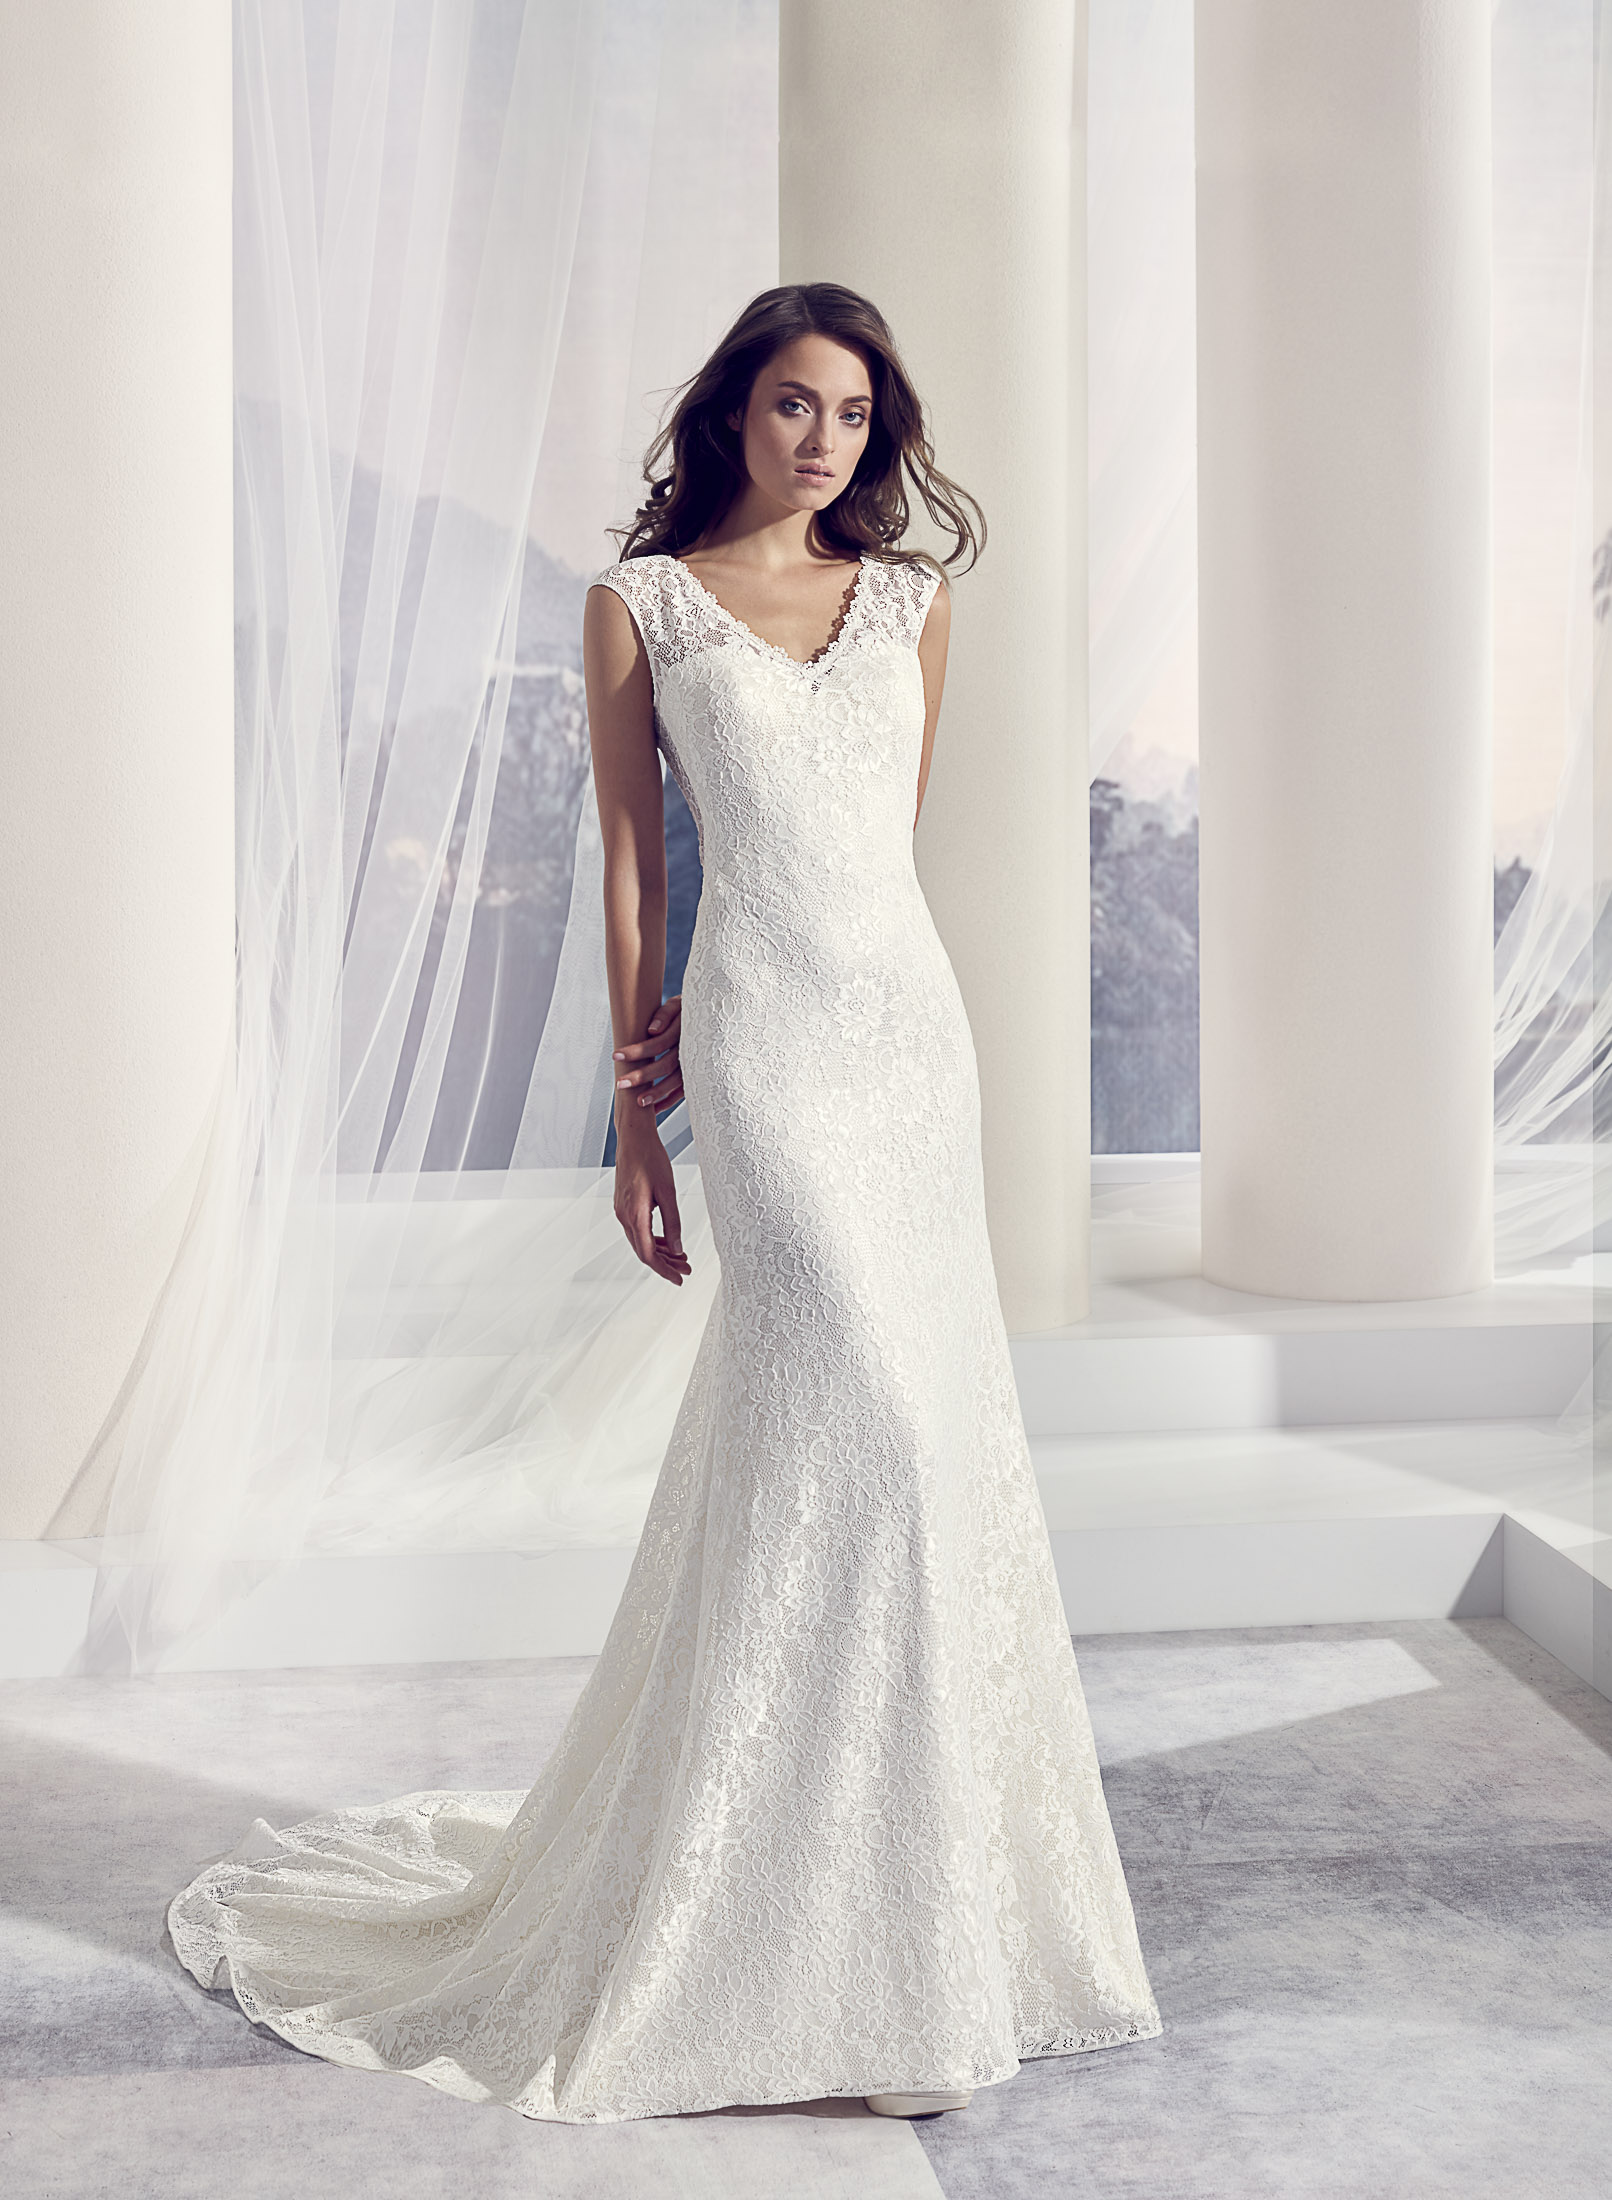 Modeca Trust Truly Bridal Boutique - Bridal Village